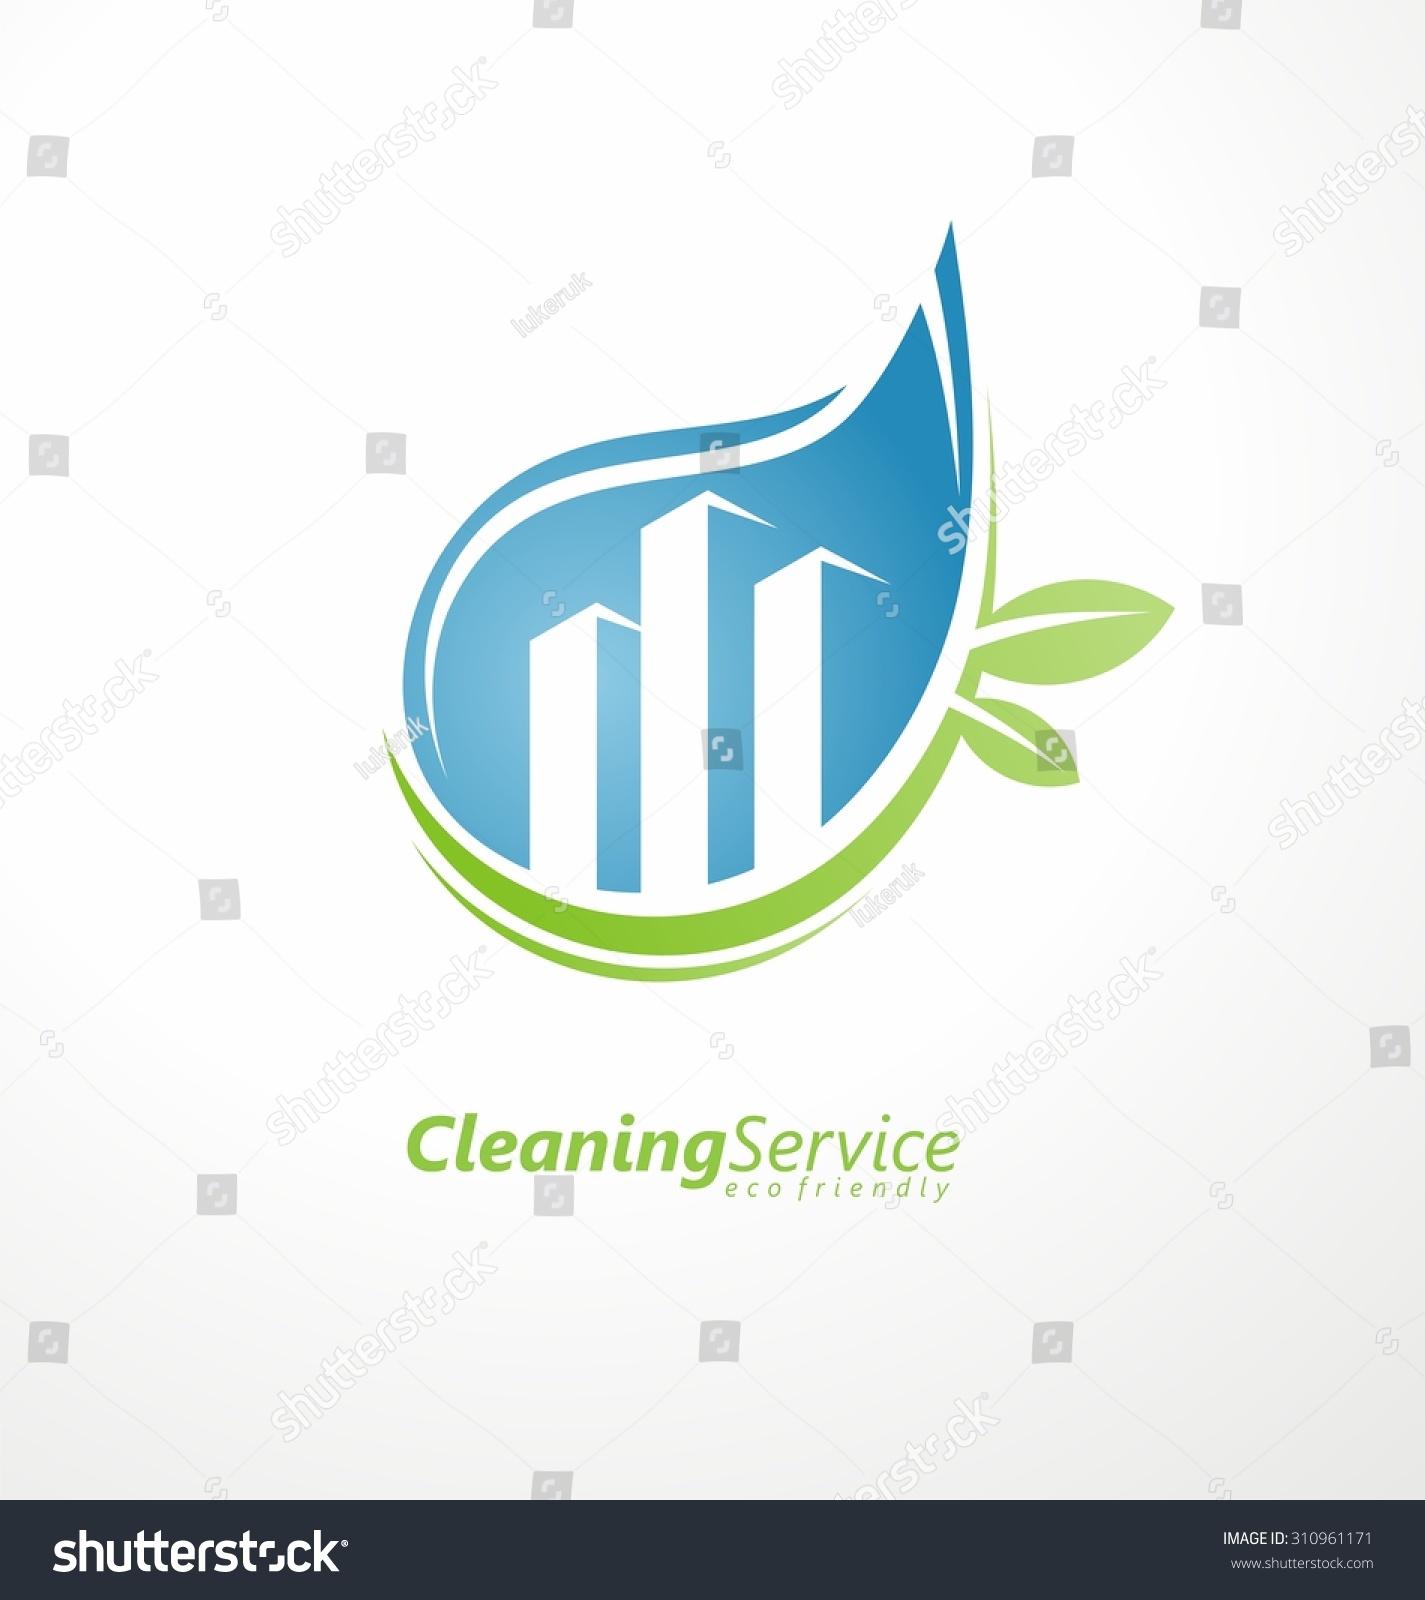 cleaning service logo design idea water drop with buildings in negative space creative eco - Logo Design Idea